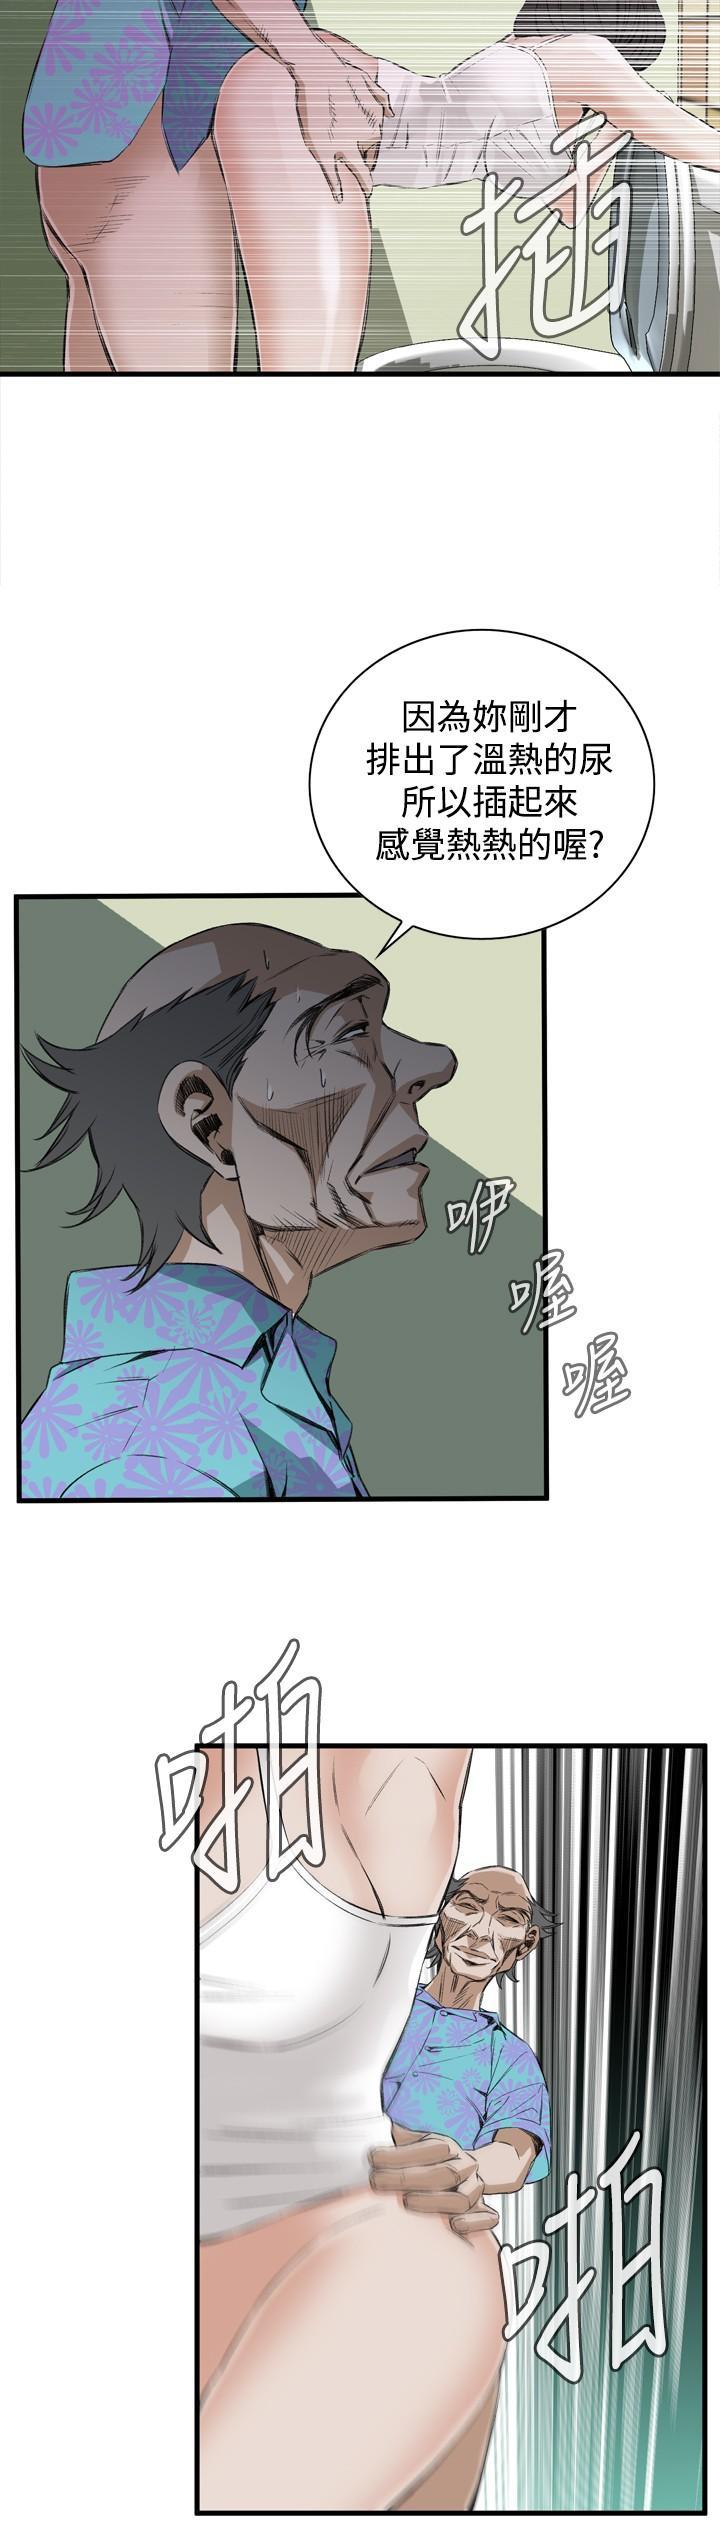 Take a Peek 偷窥 Ch.39~51 [Chinese]中文 275